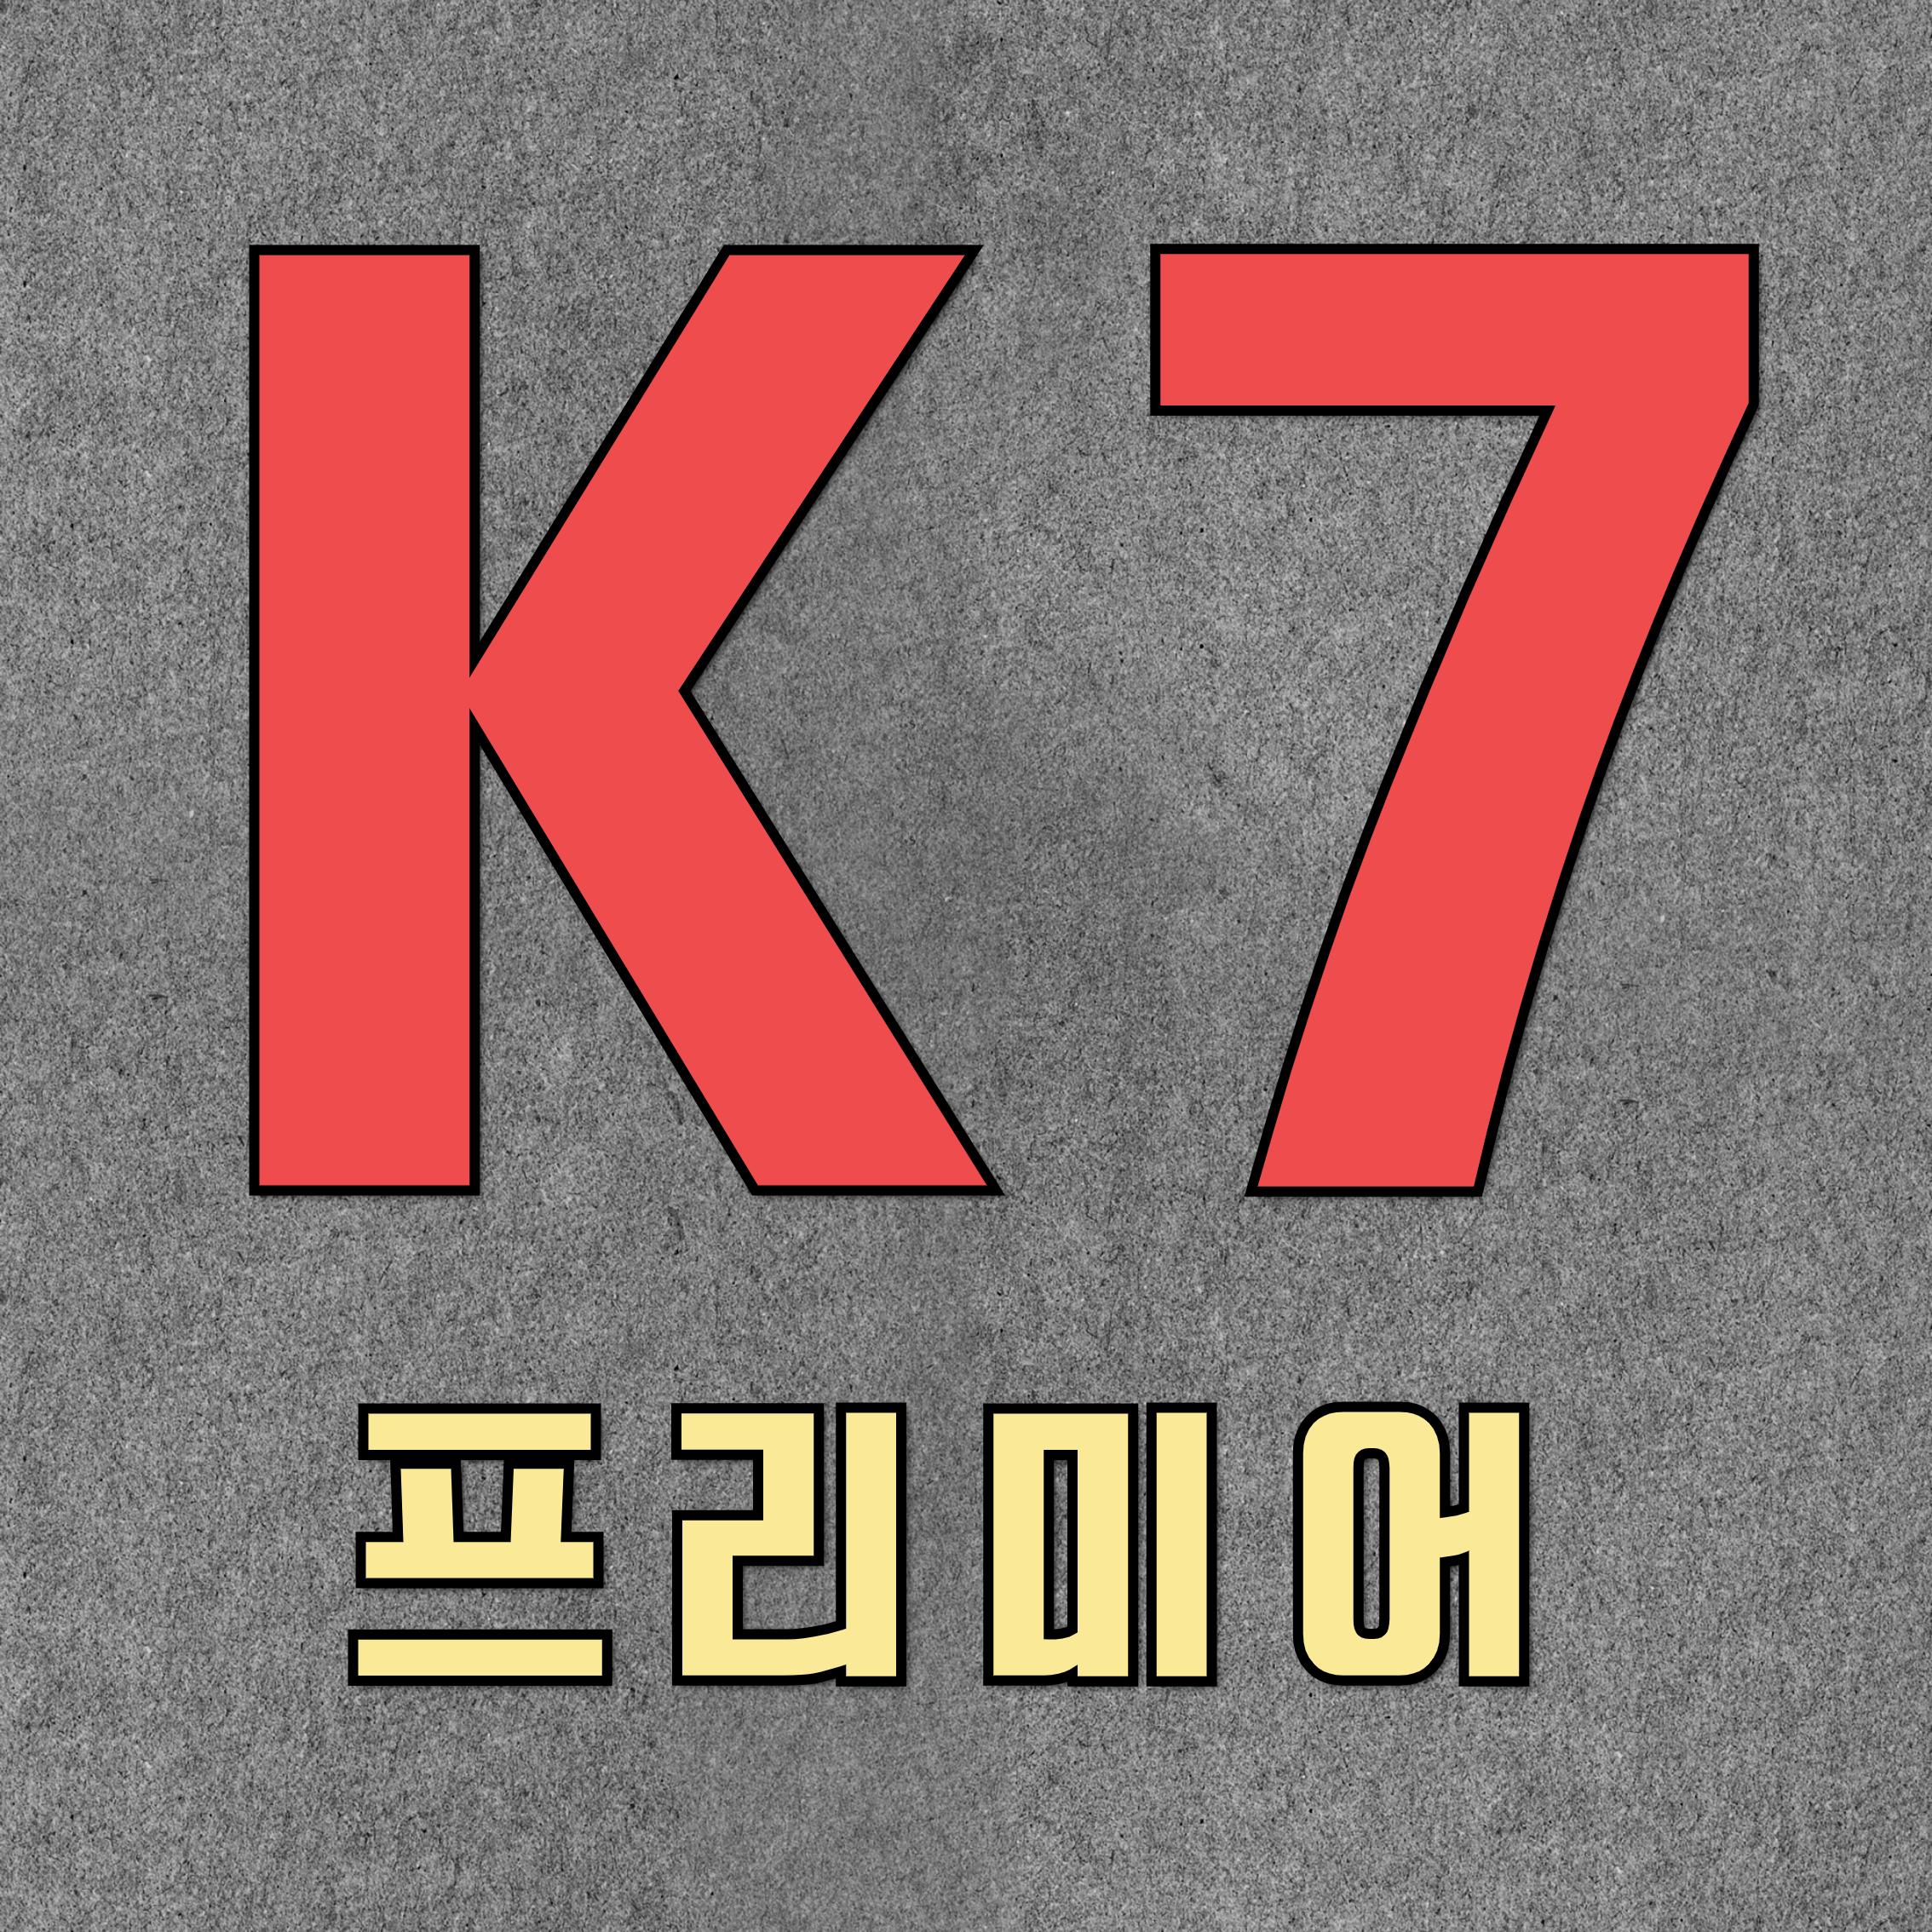 K7 프리미어 1